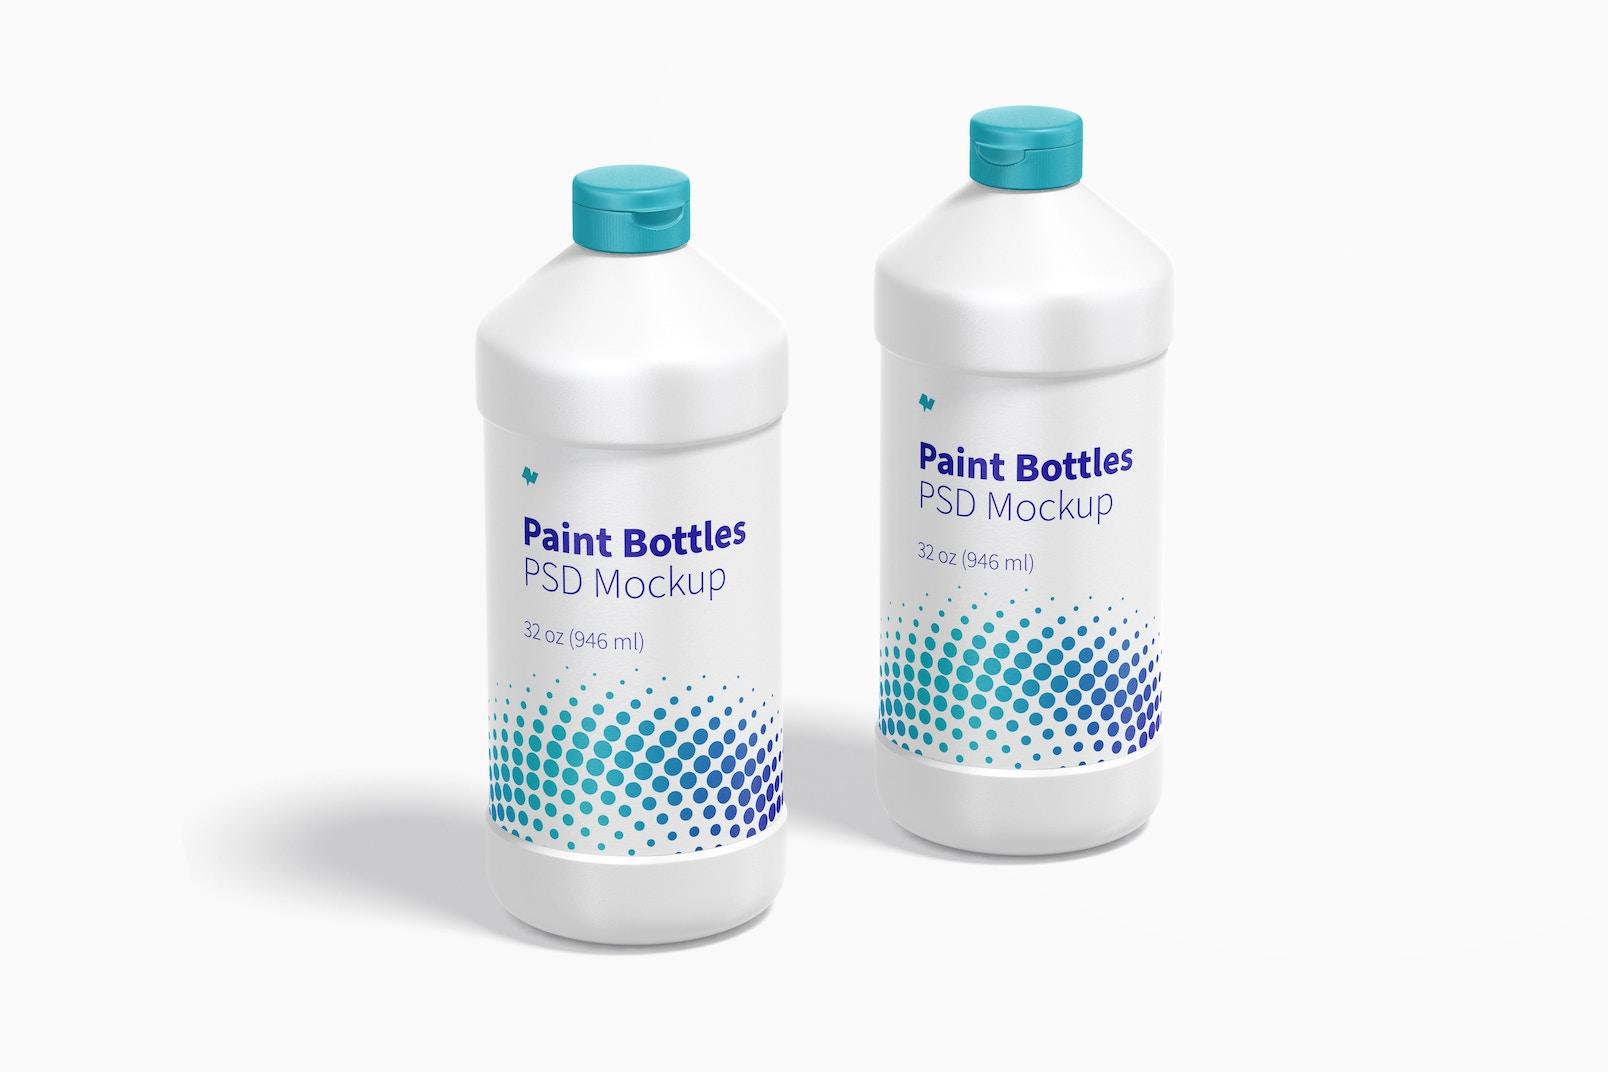 32 oz Paint Bottles Mockup